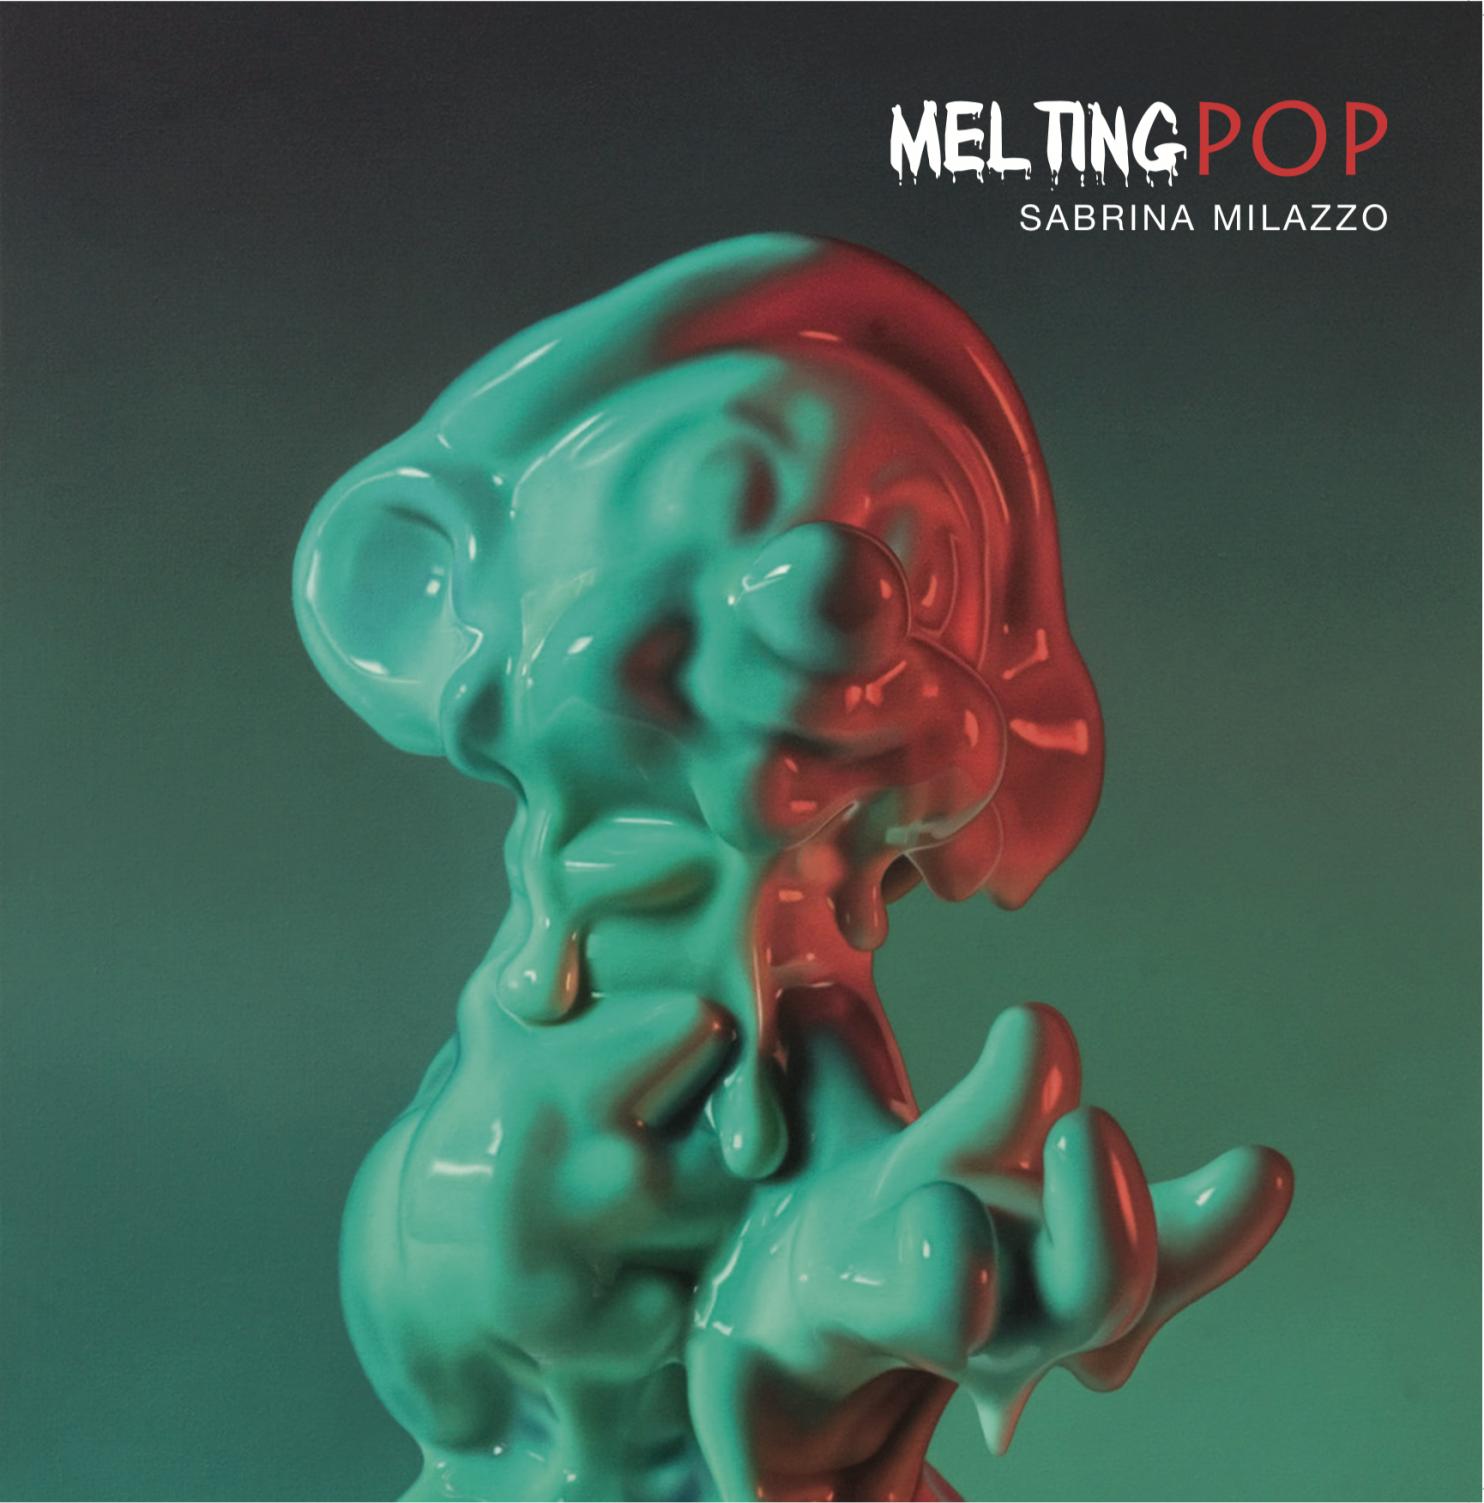 Copertina catalogo melting popo milazzo